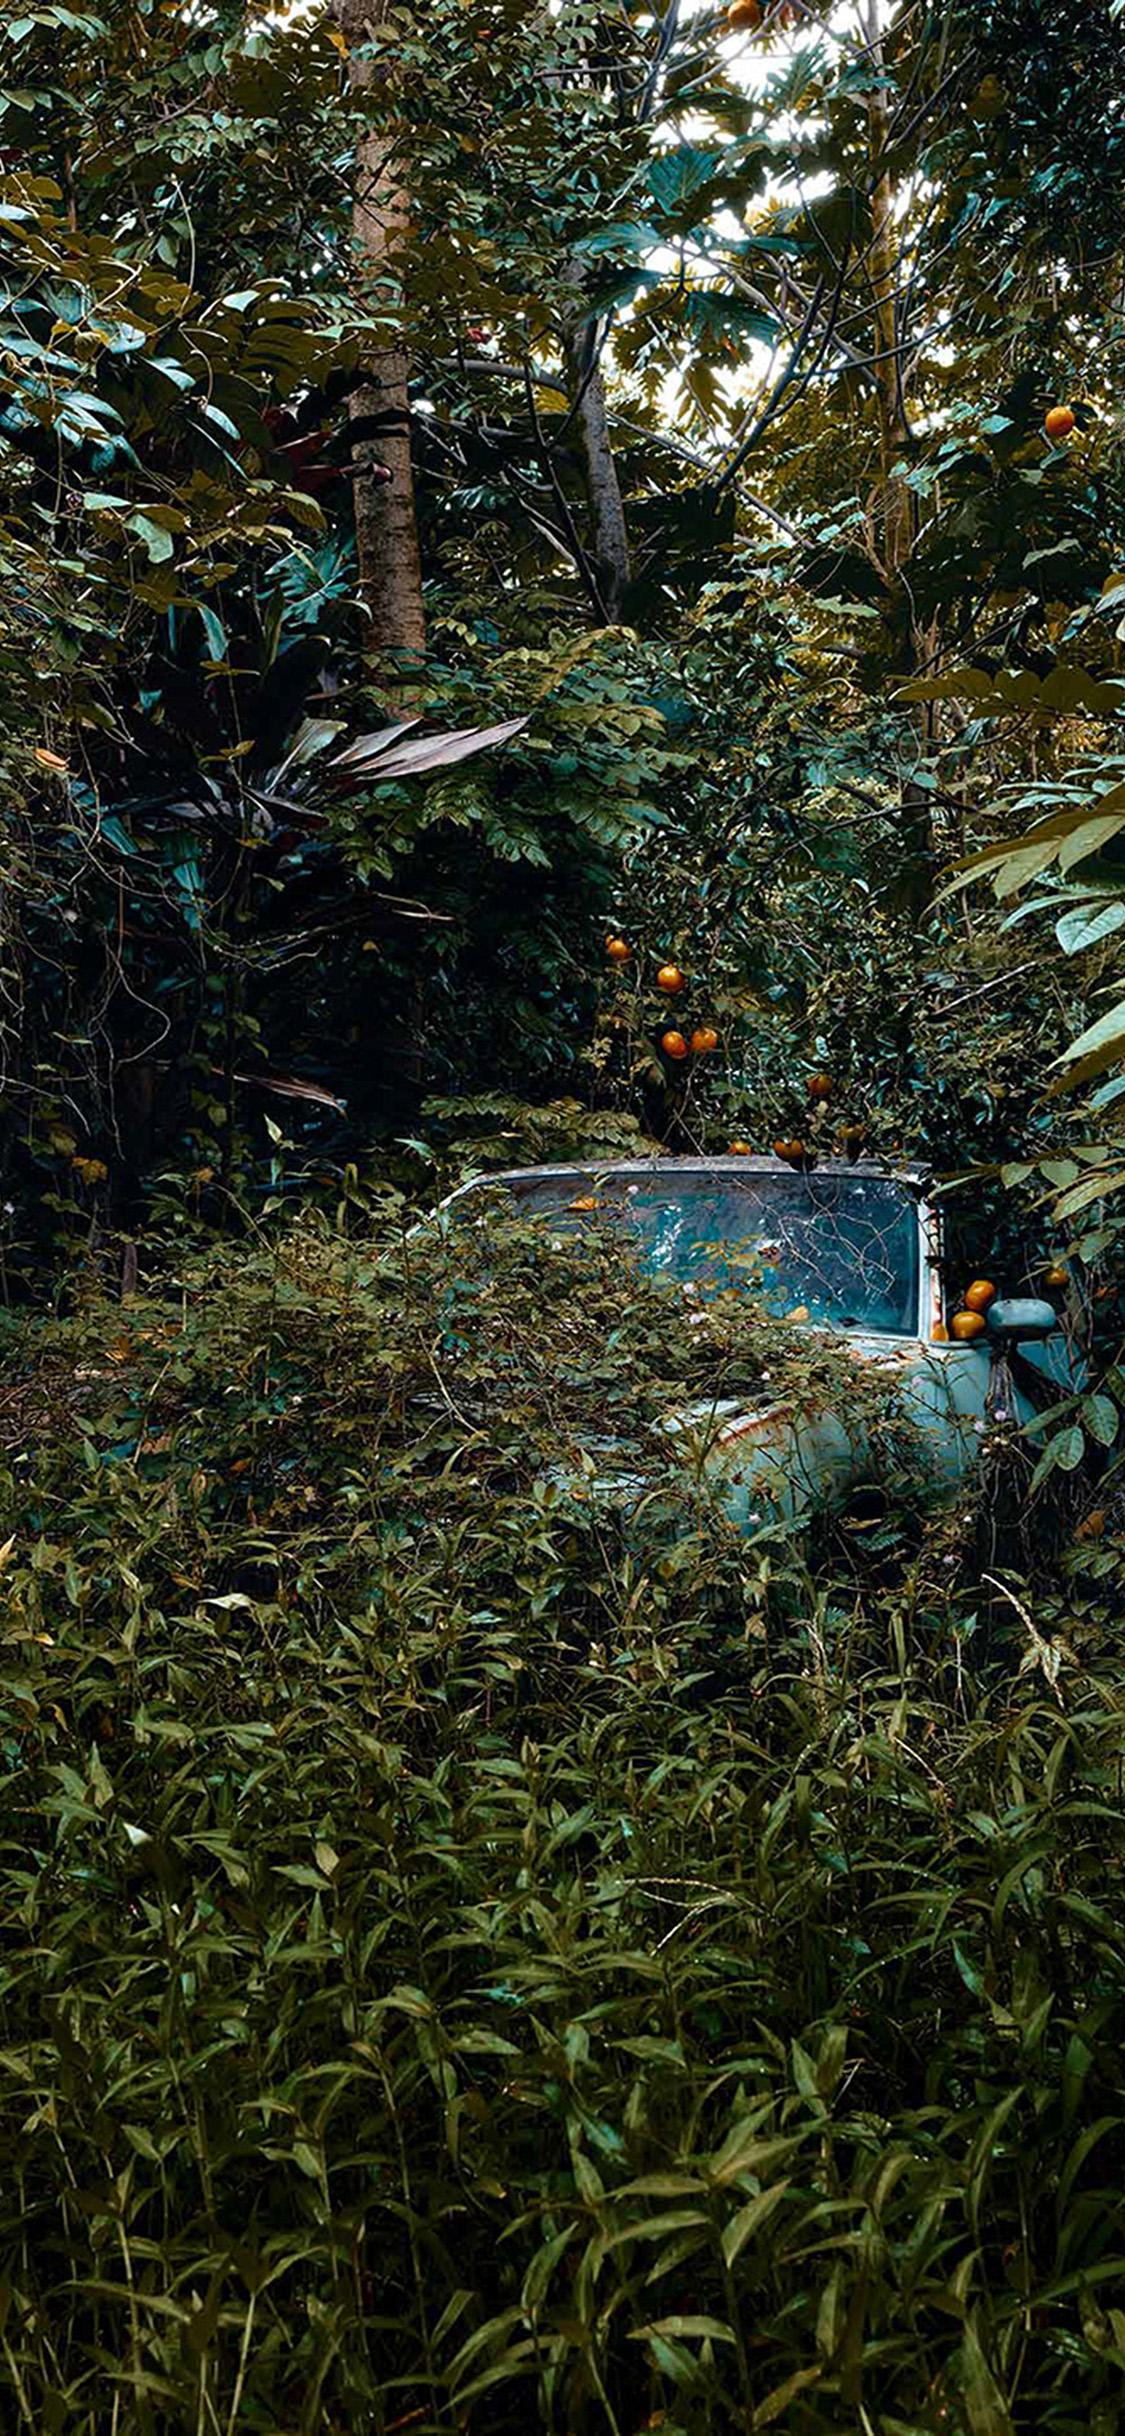 iPhonexpapers.com-Apple-iPhone-wallpaper-bk26-art-forest-car-nature